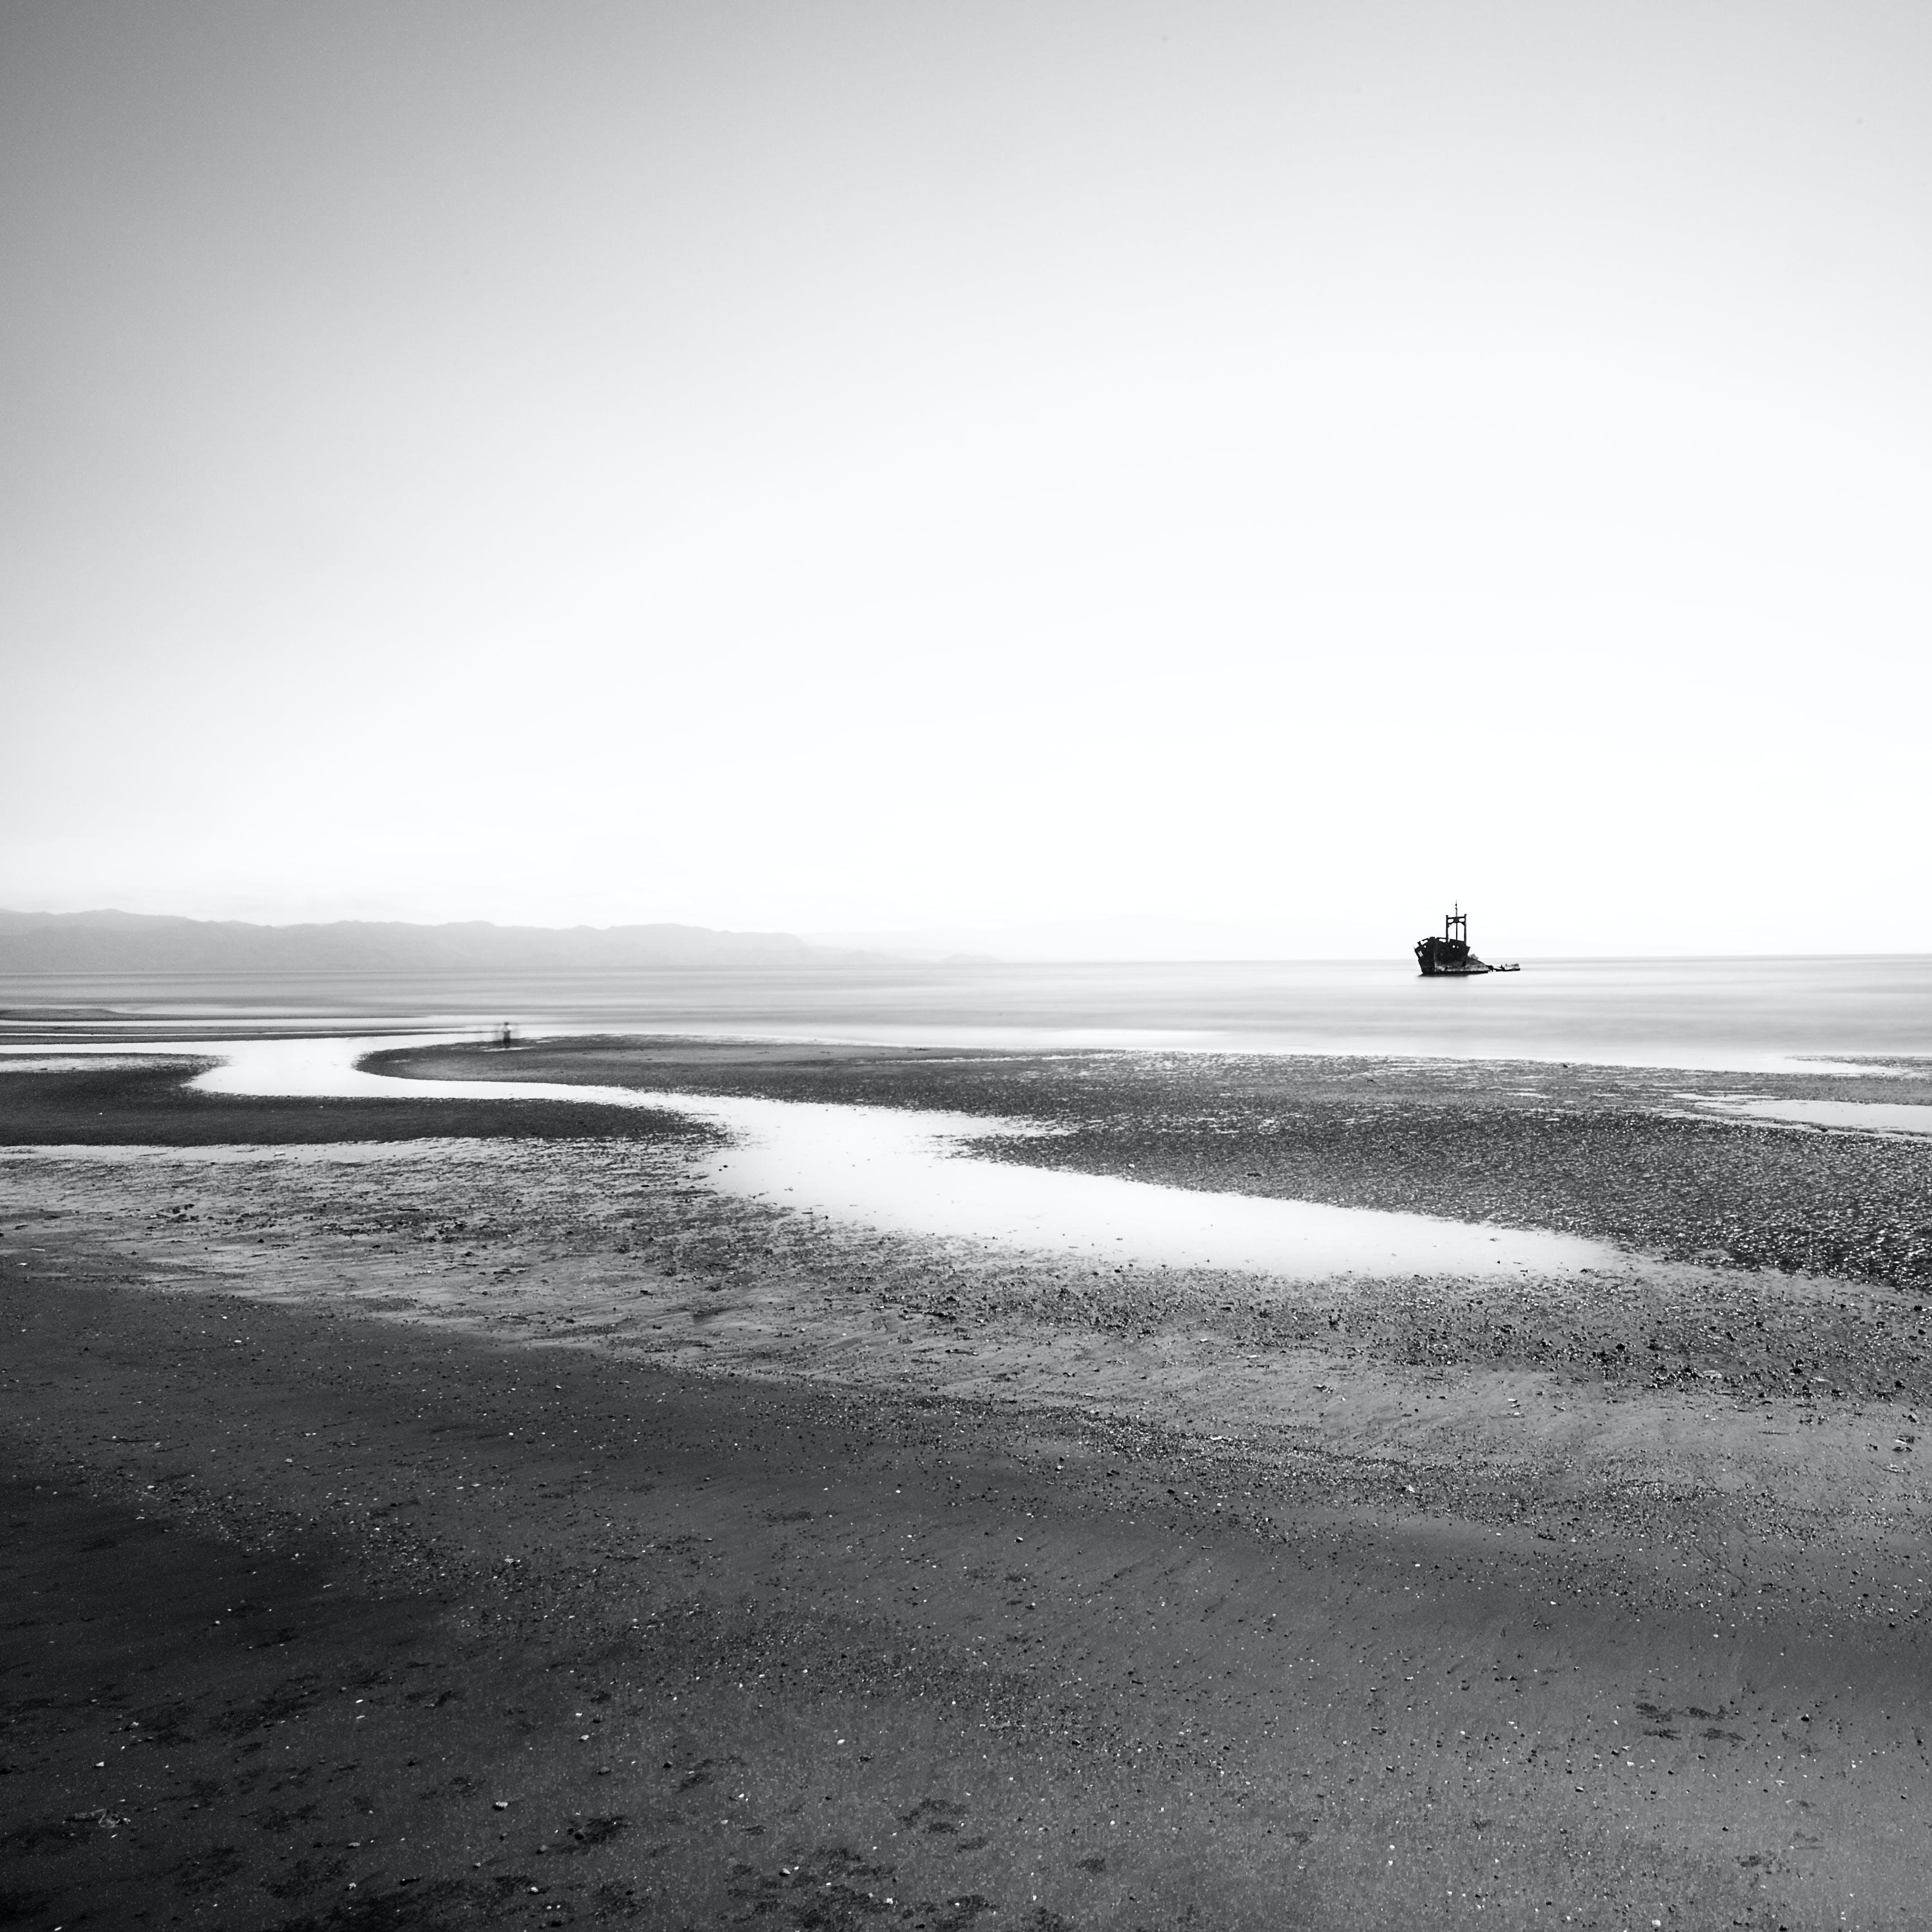 Kostenloses Stock Foto zu meer, meeresküste, ozean, sand